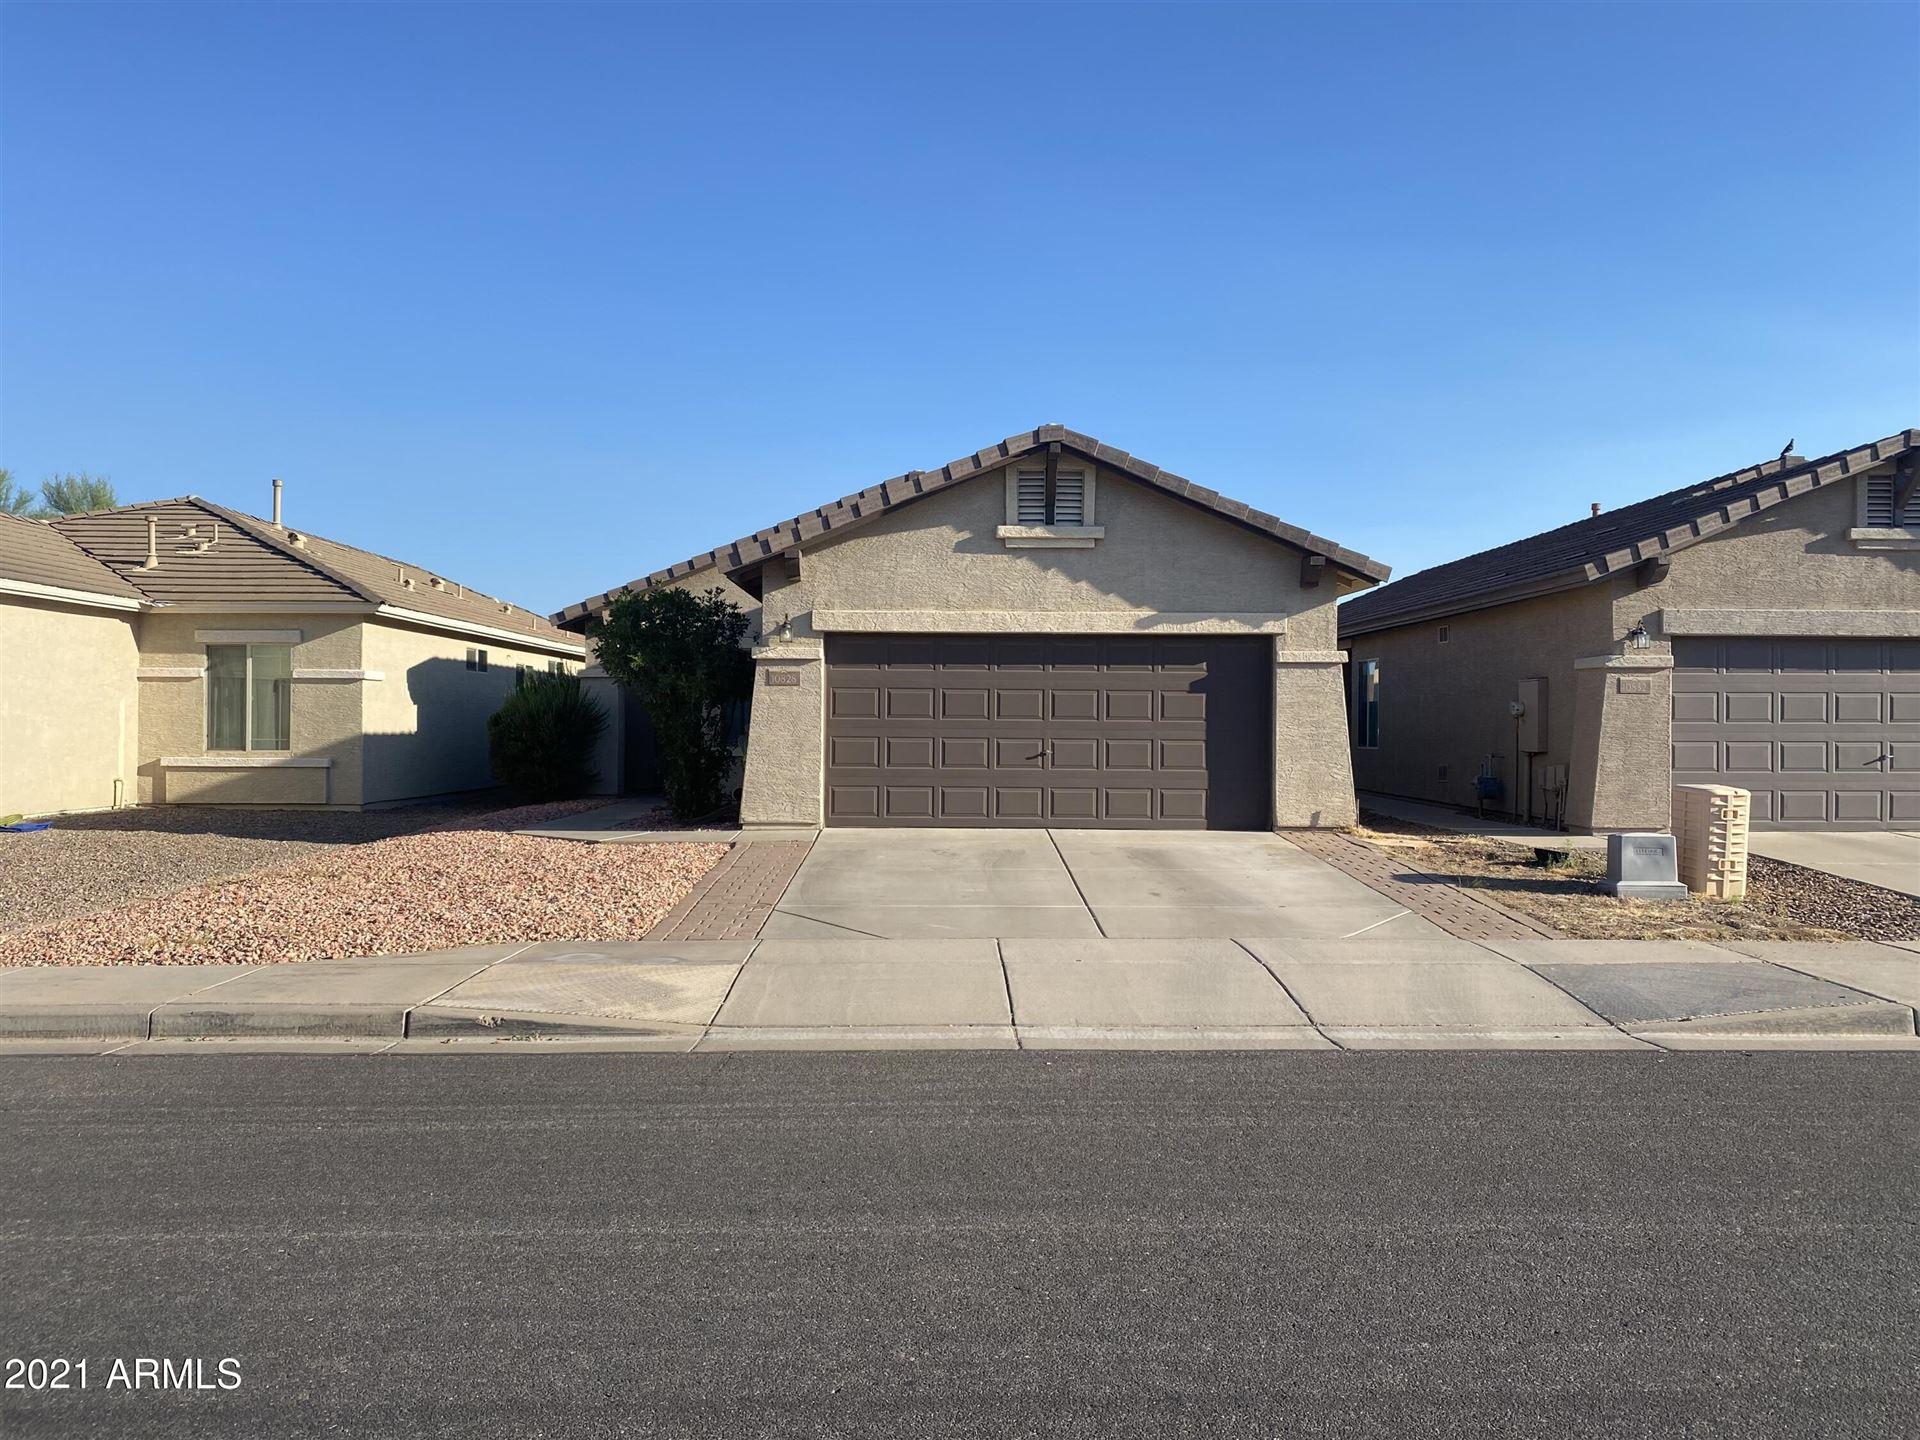 Photo of 10828 E BOSTON Street, Apache Junction, AZ 85120 (MLS # 6295989)